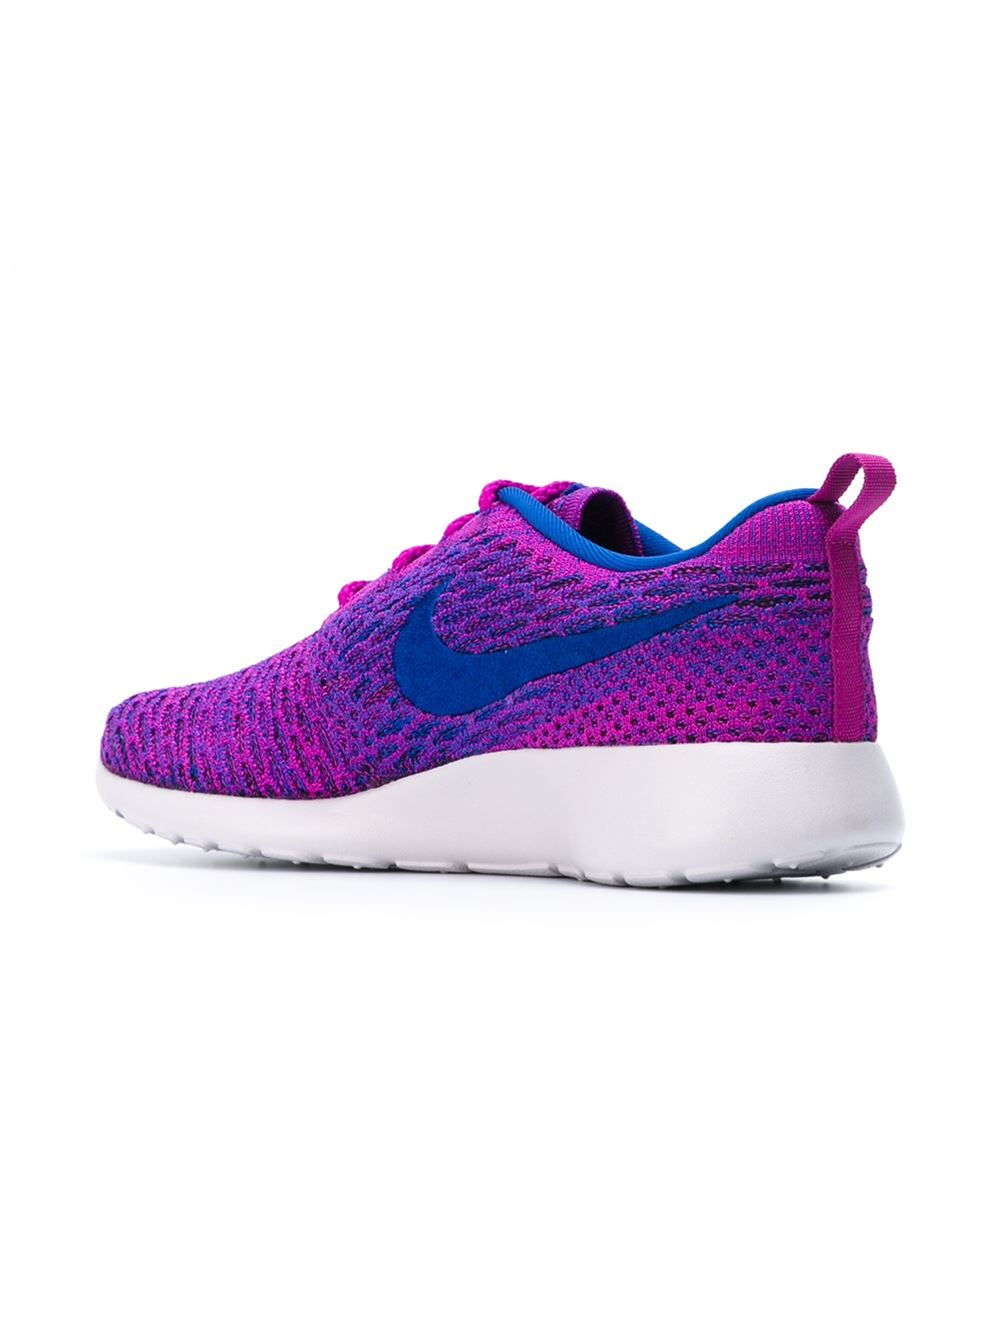 nike 39 roshe run flyknit 39 sneakers in pink pink purple. Black Bedroom Furniture Sets. Home Design Ideas